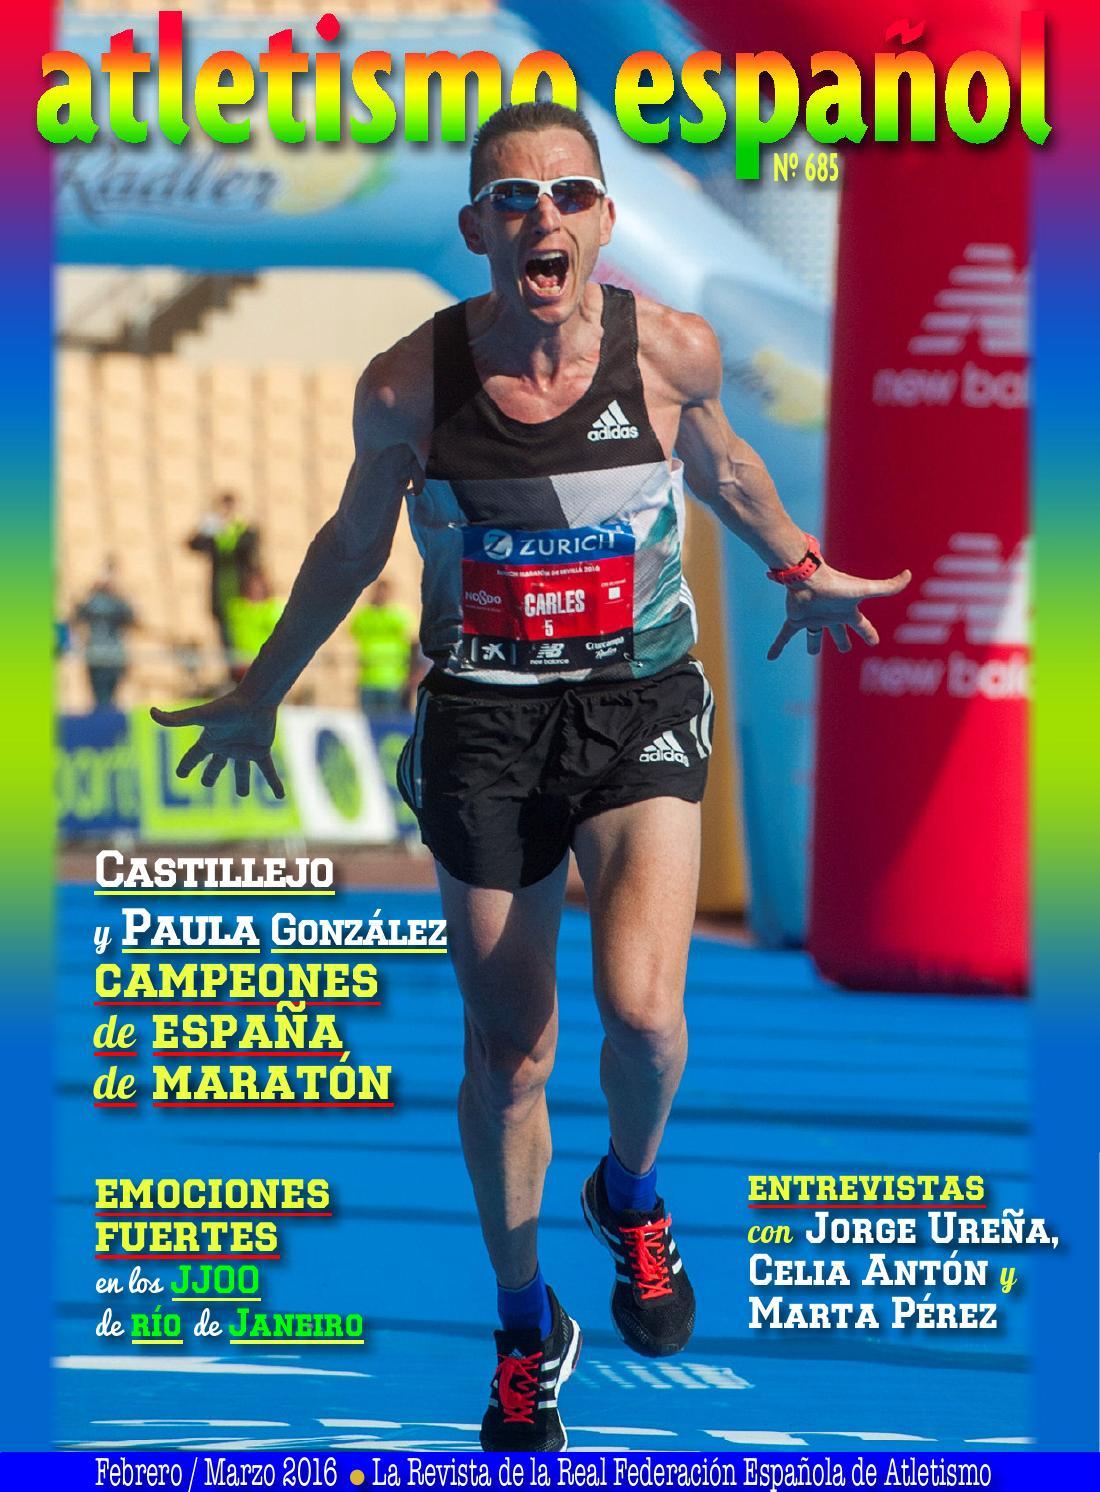 685 atletismo español - Febrero/Marzo 2016 by atletismo español - issuu